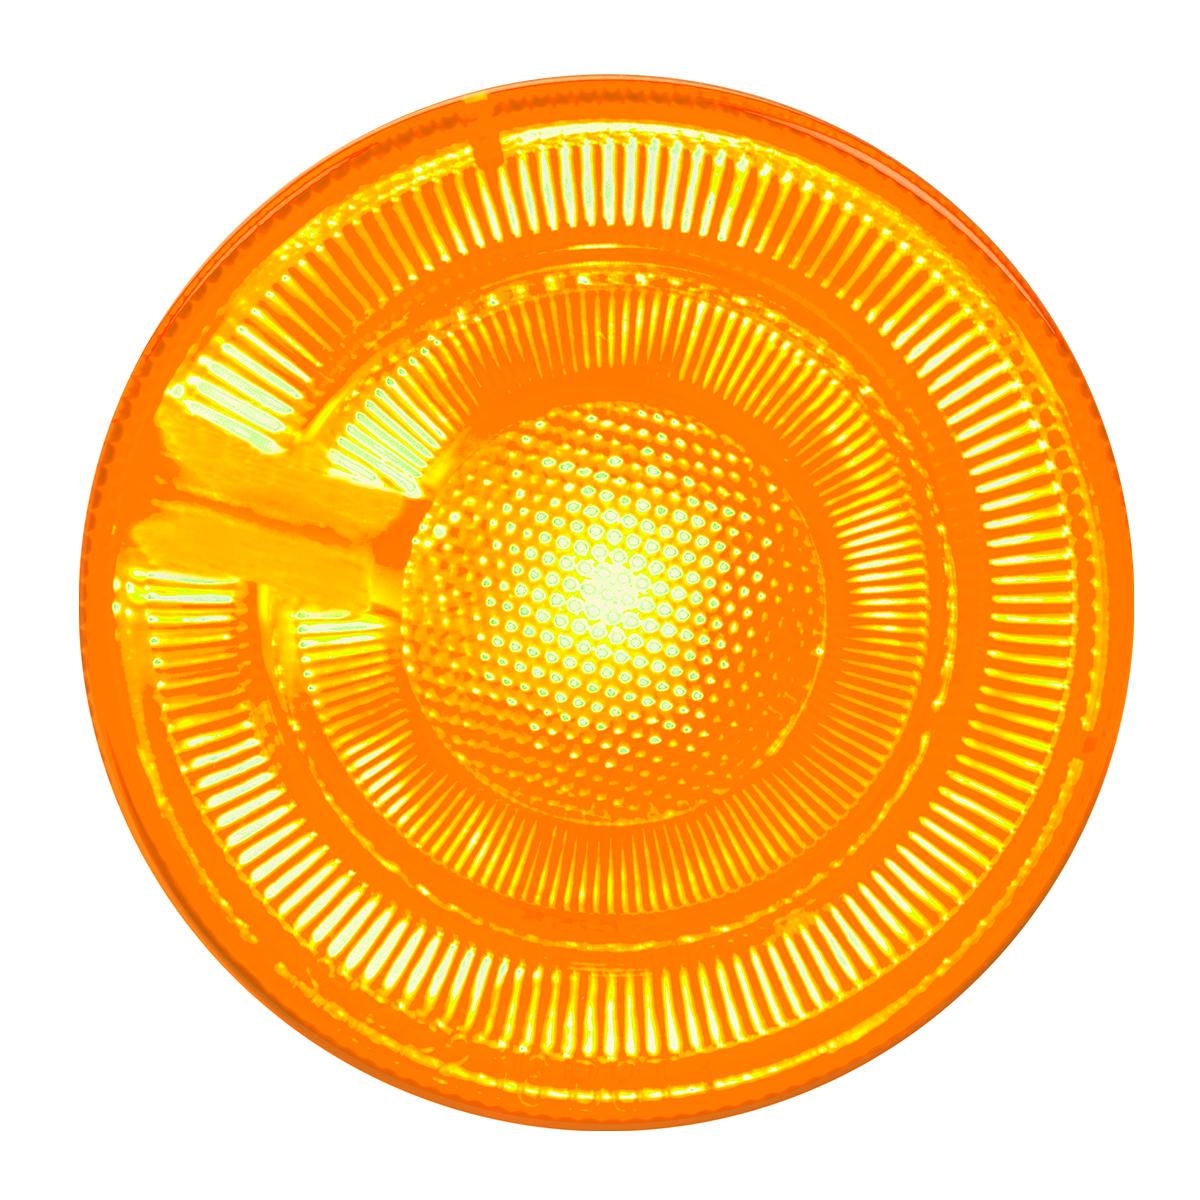 "75940 2-1/2"" Prime LED Marker Light"